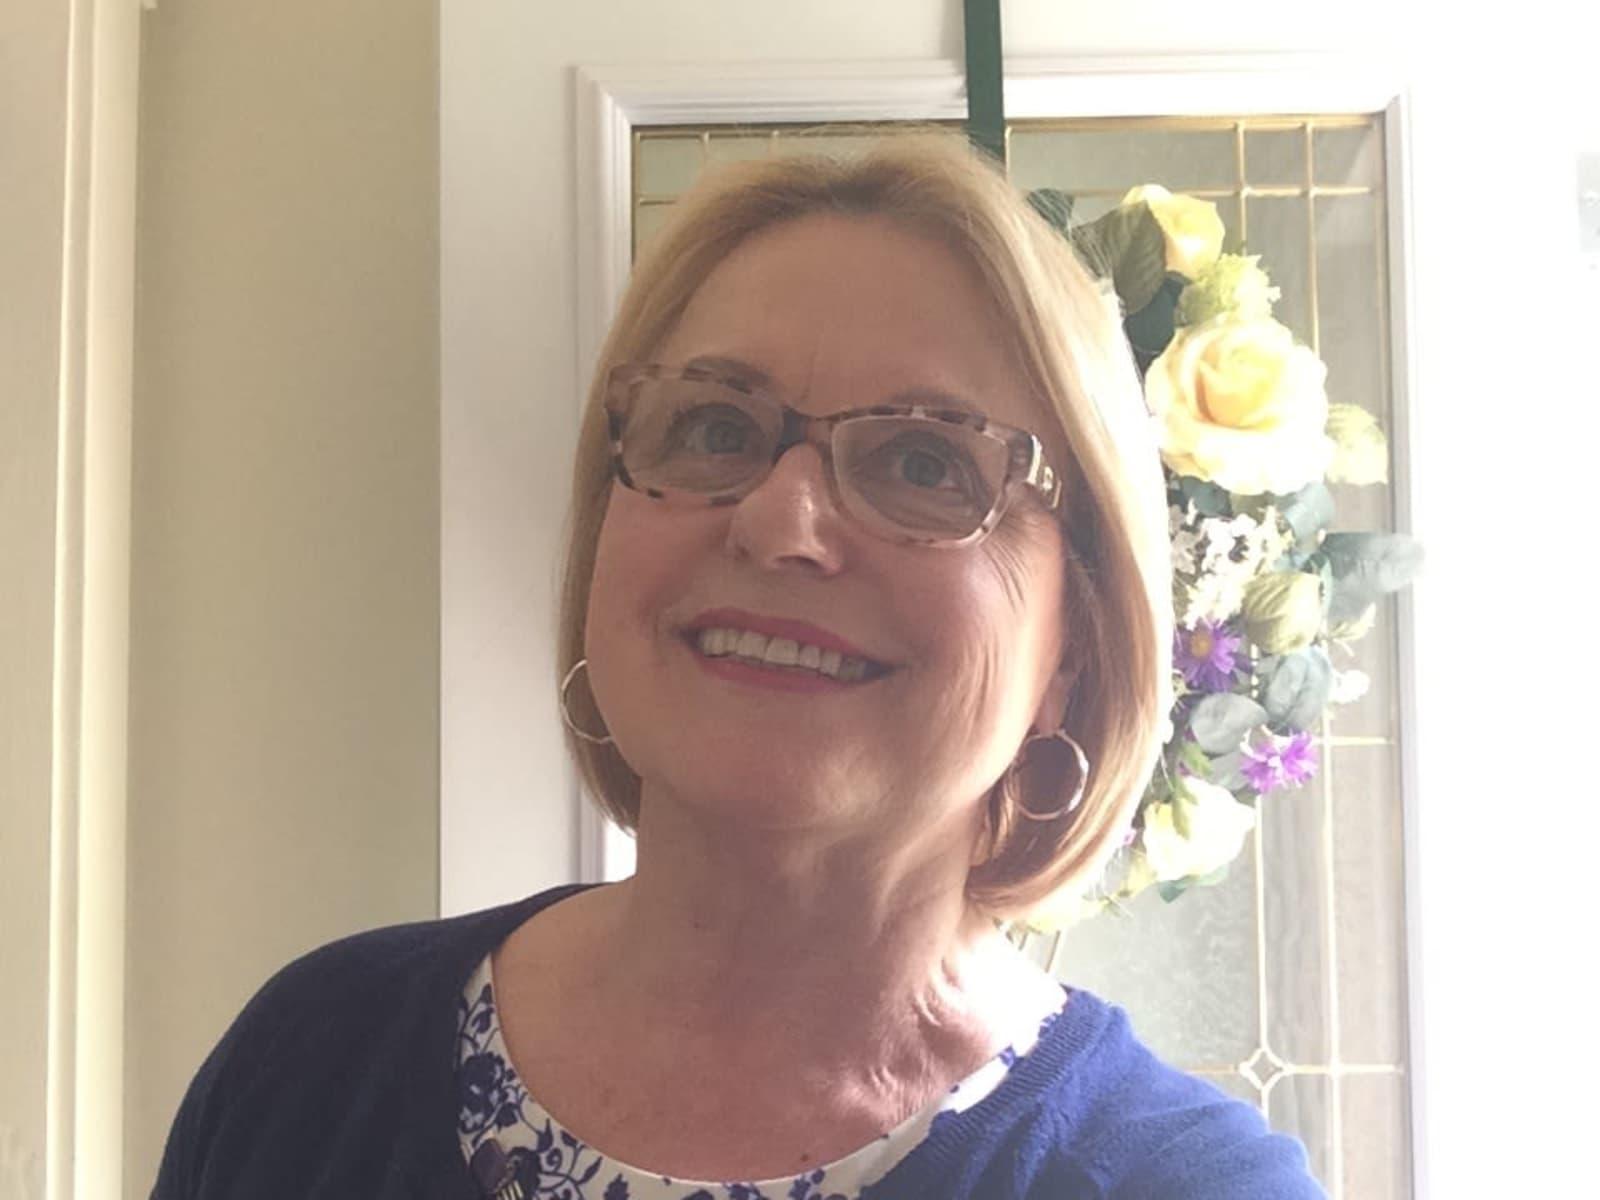 Linda from Prince Albert, Saskatchewan, Canada